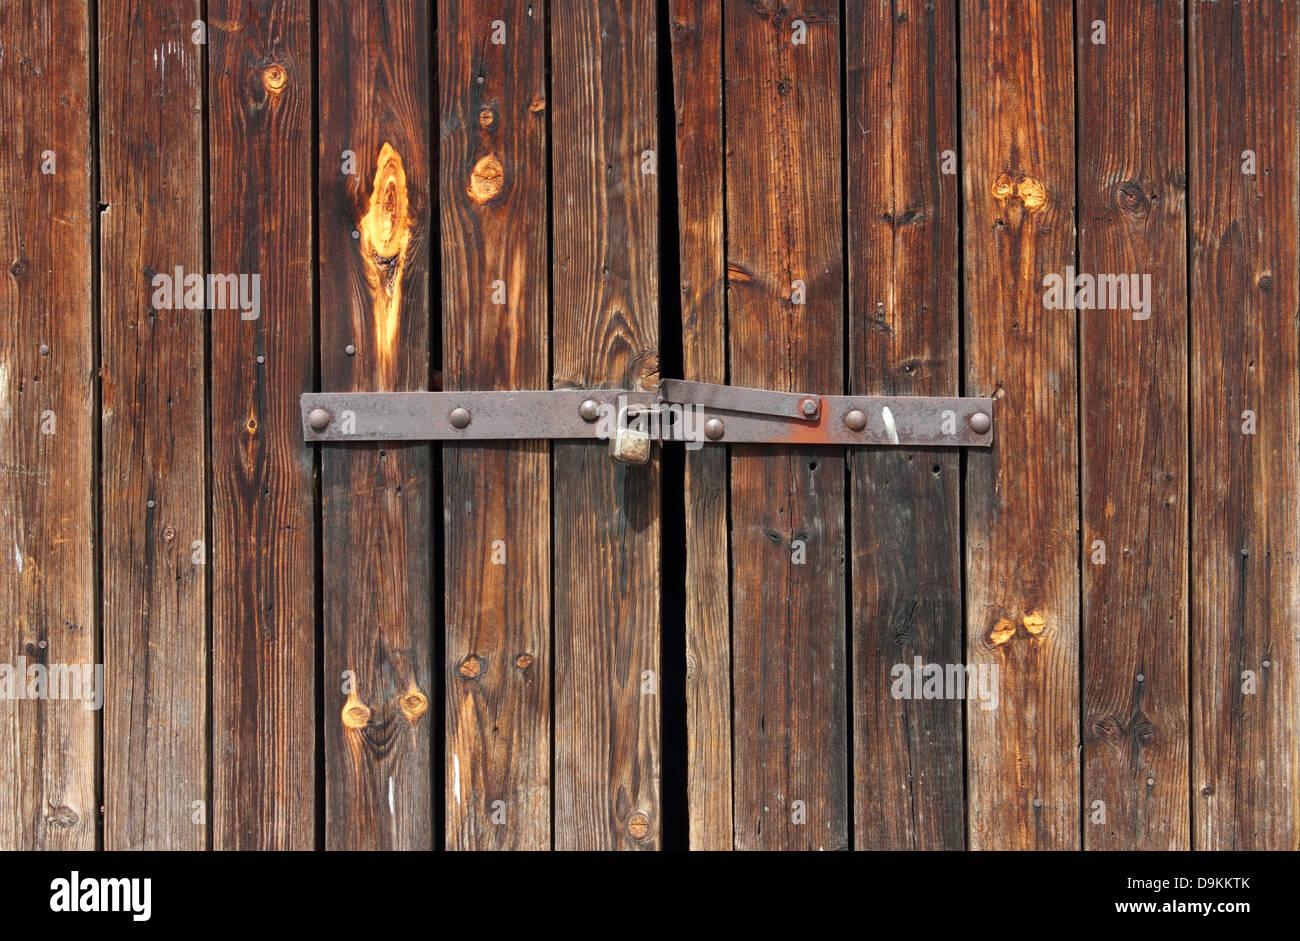 Old Wooden door locked with rusty padlock background. Stock Photo